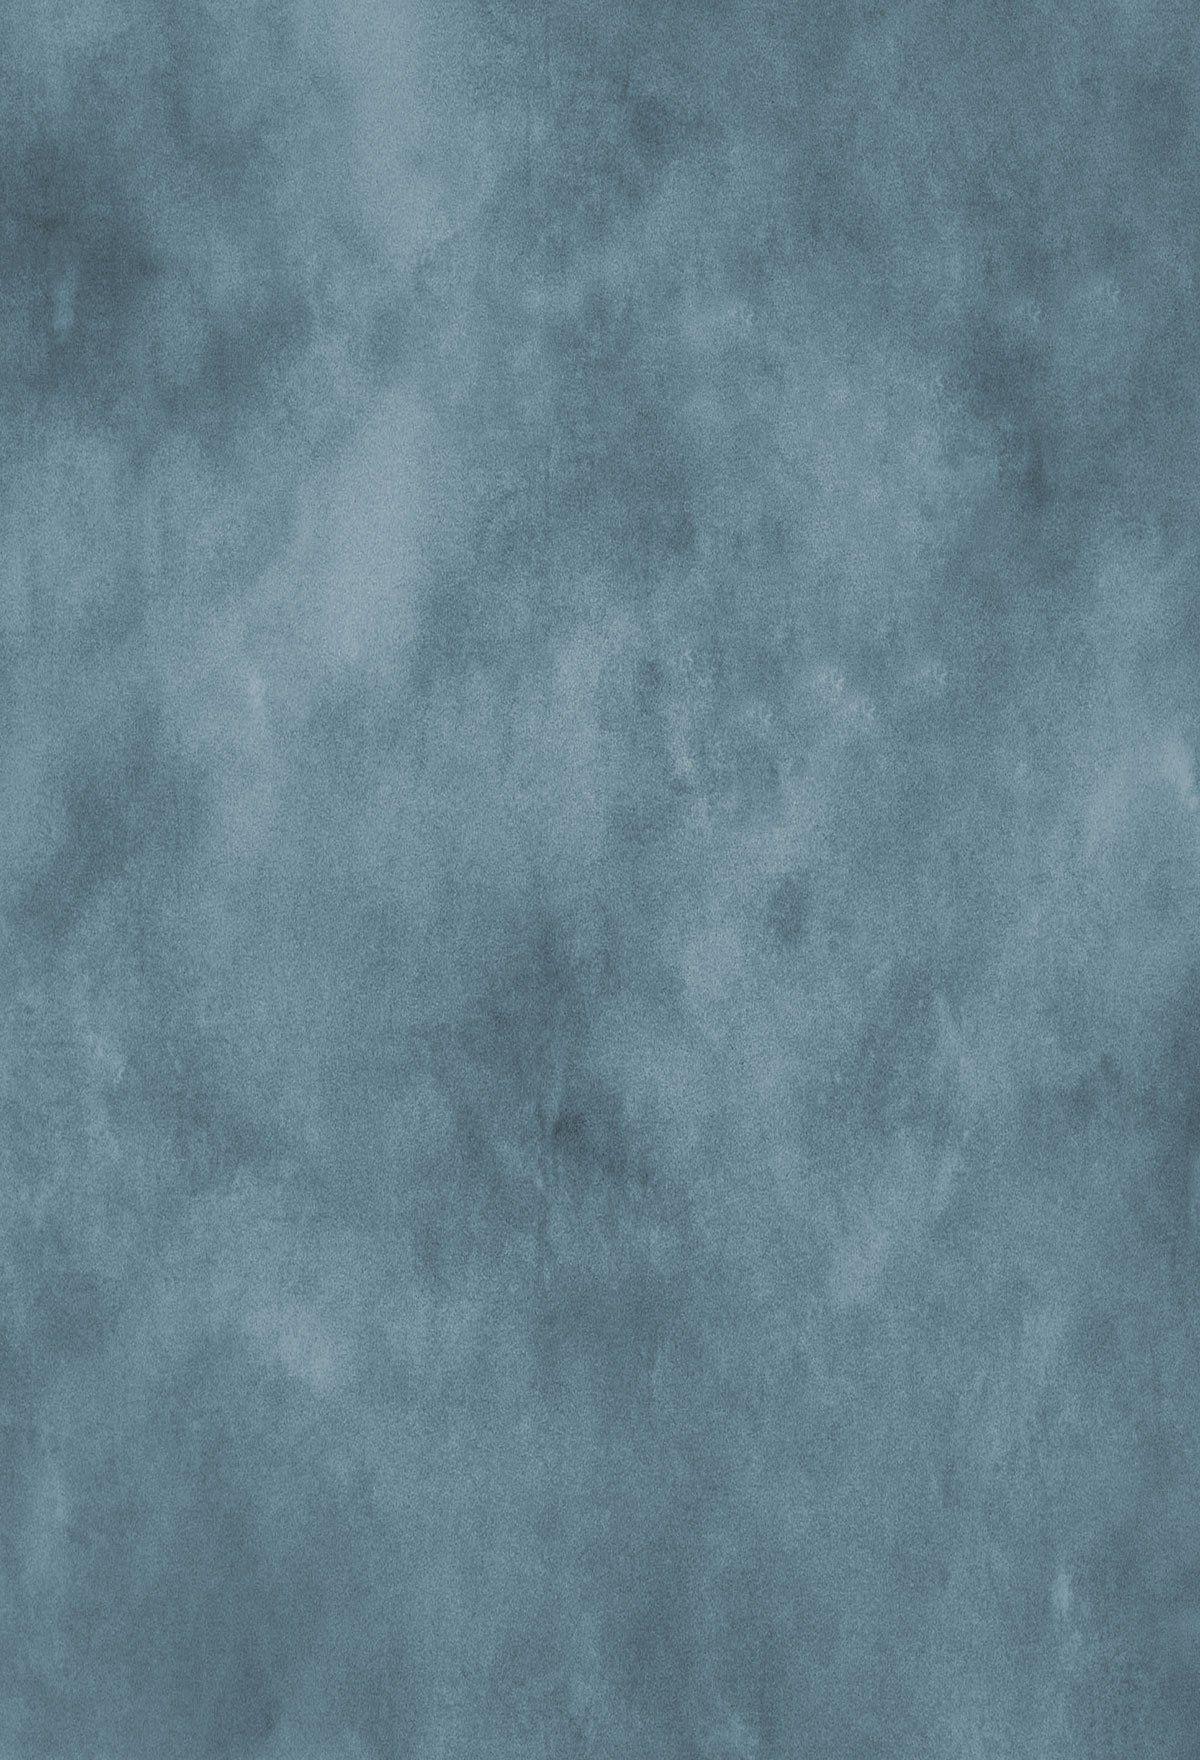 Kate Gray Light Blue Abstract Texture Senior Portrait Backdrop